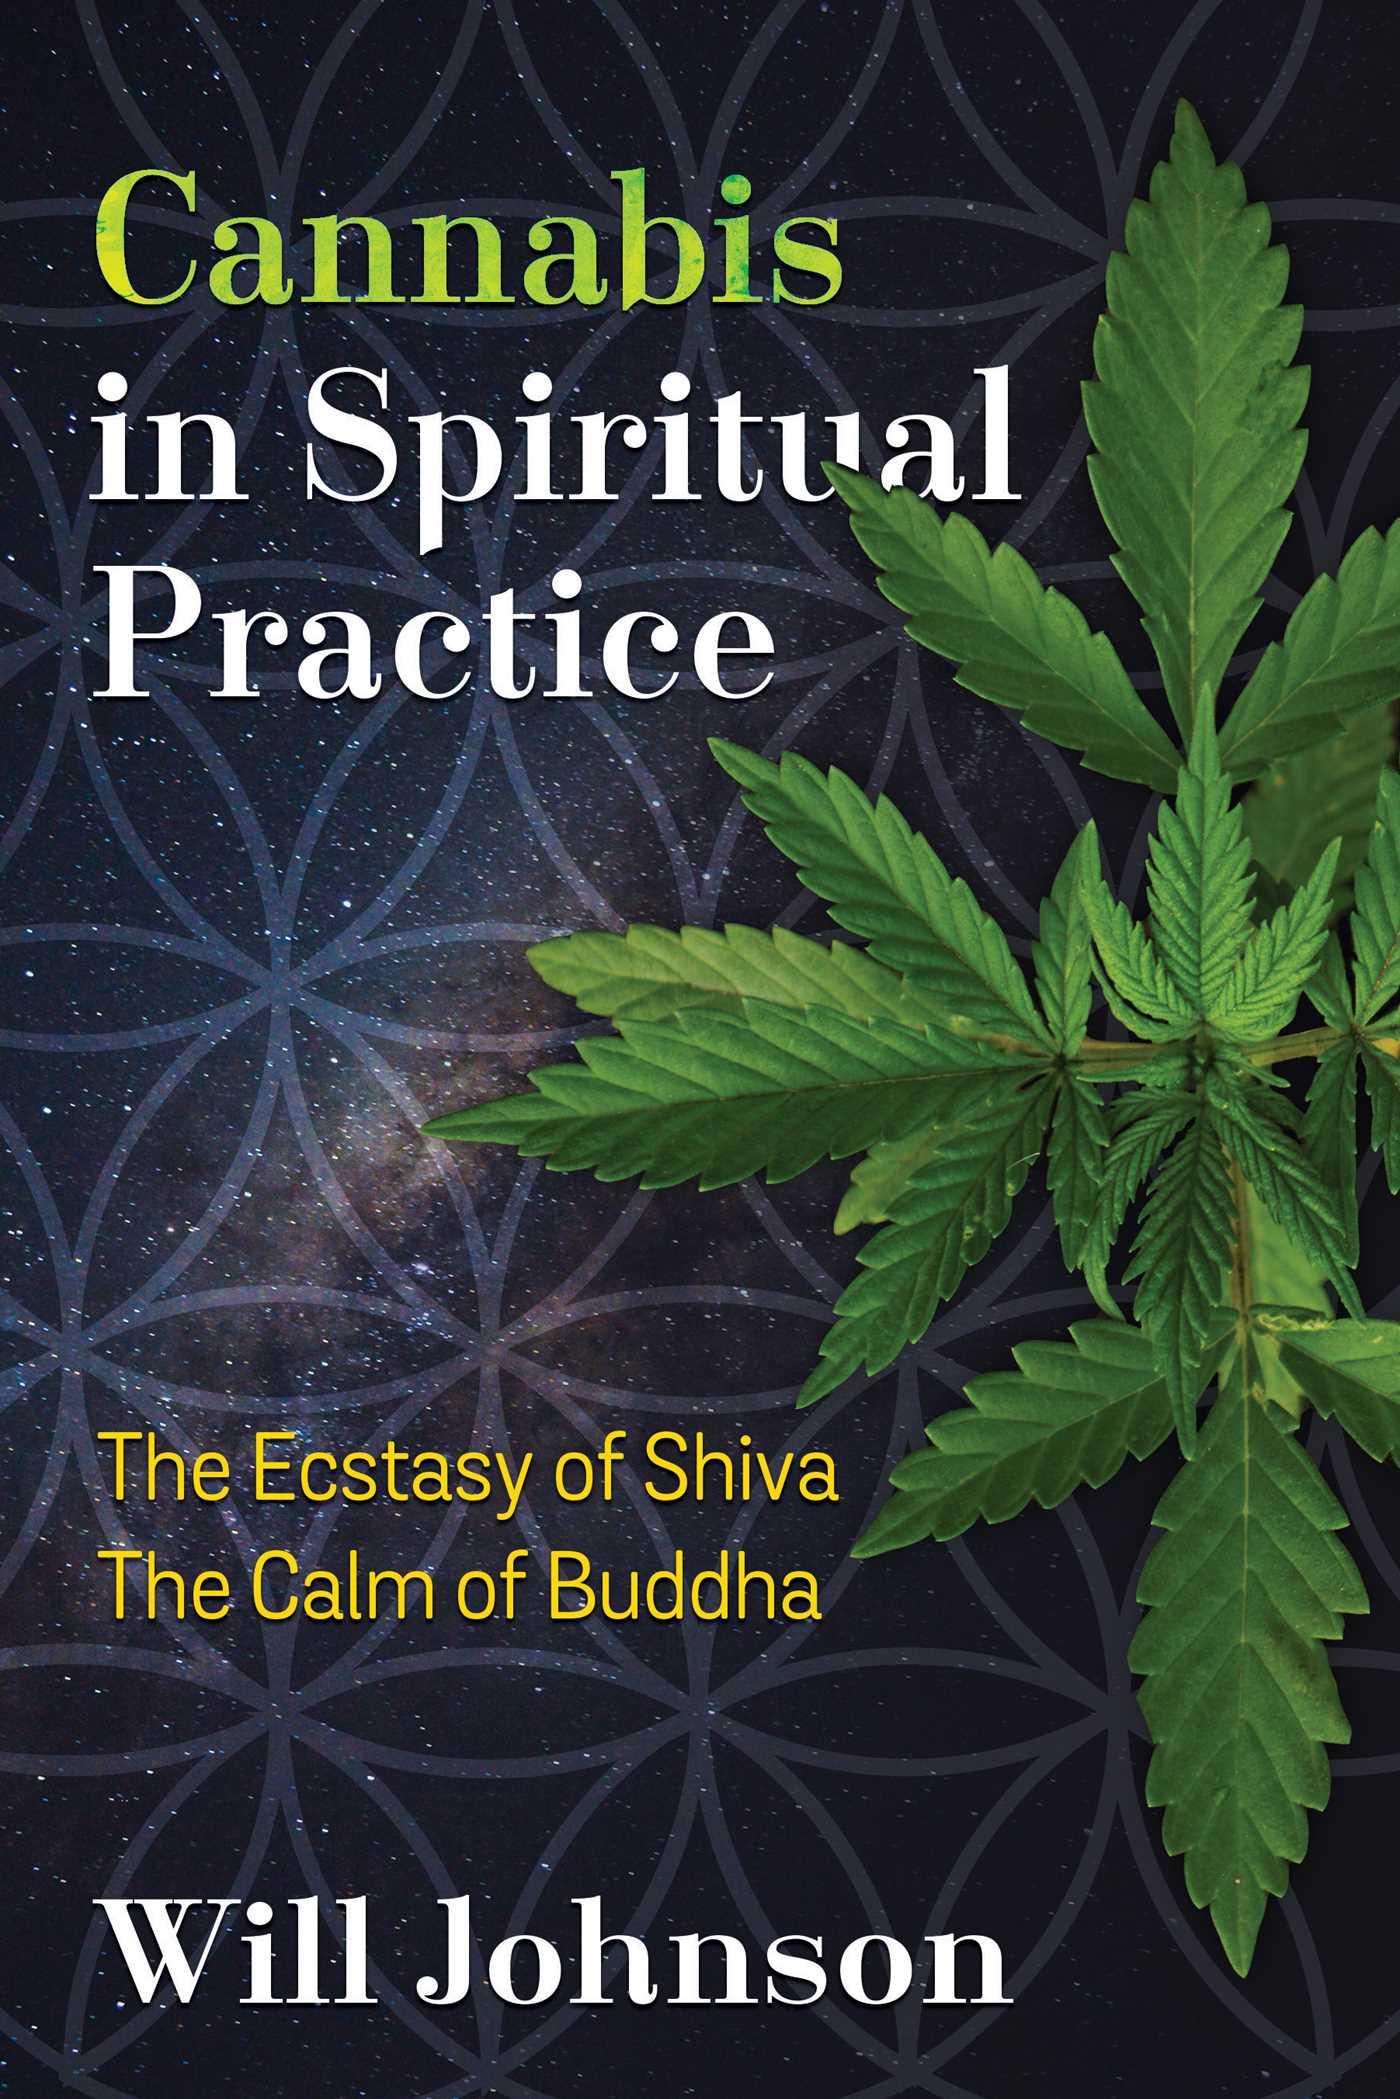 Cannabis in spiritual practice 9781620556856 hr